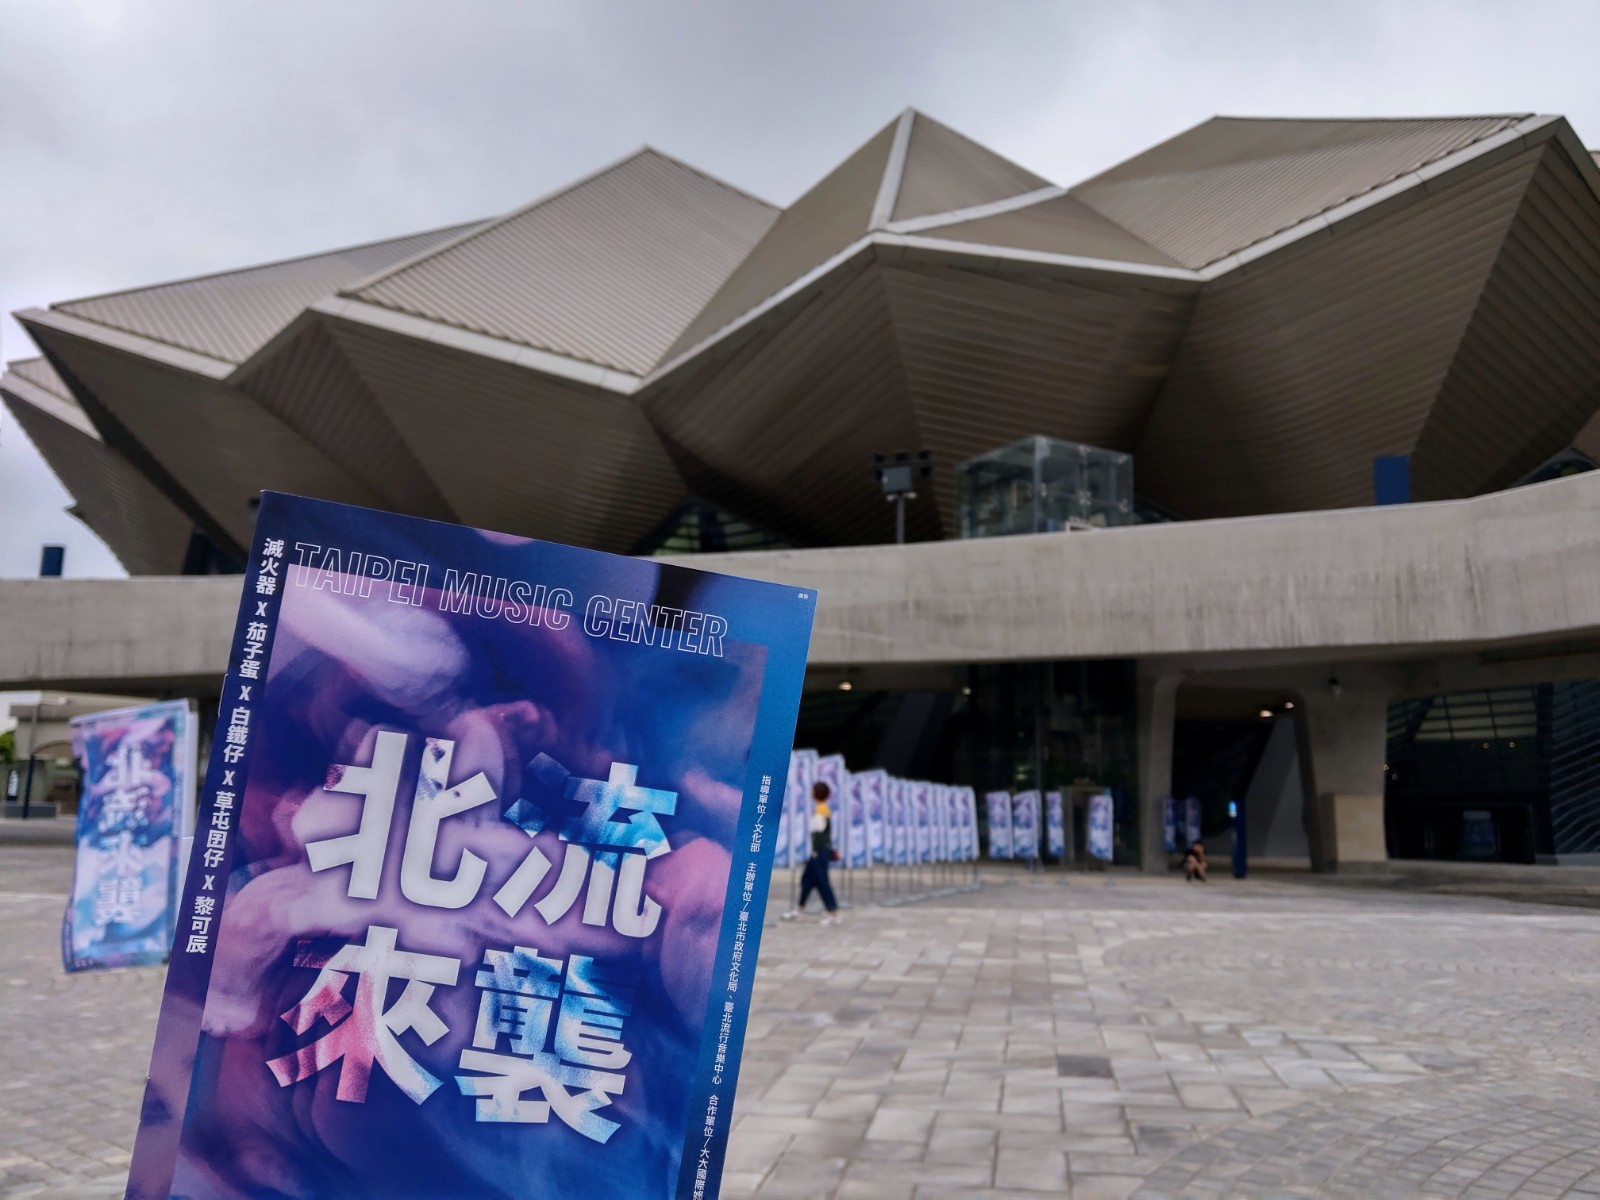 HTC新聞照片(5G試驗場域「臺北流行音樂中心」表演廳「北流來襲」功能測試活動)